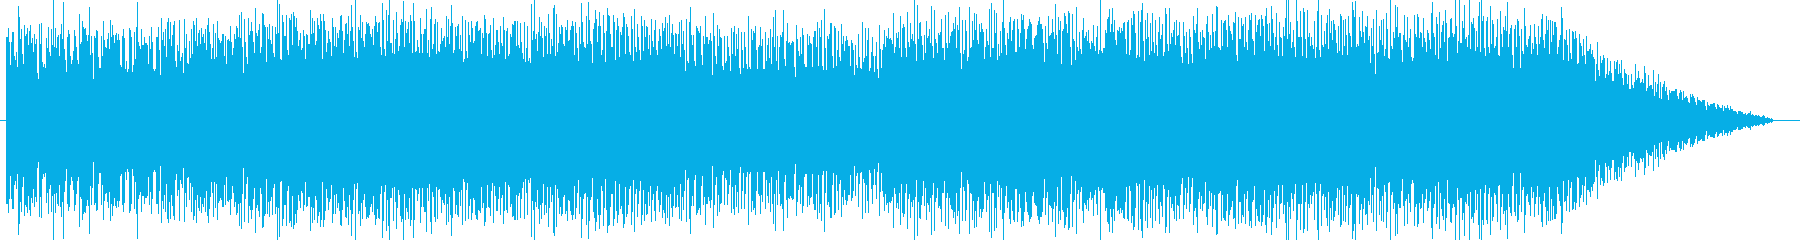 「HR/HM」「DARK系」BGM14の再生済みの波形